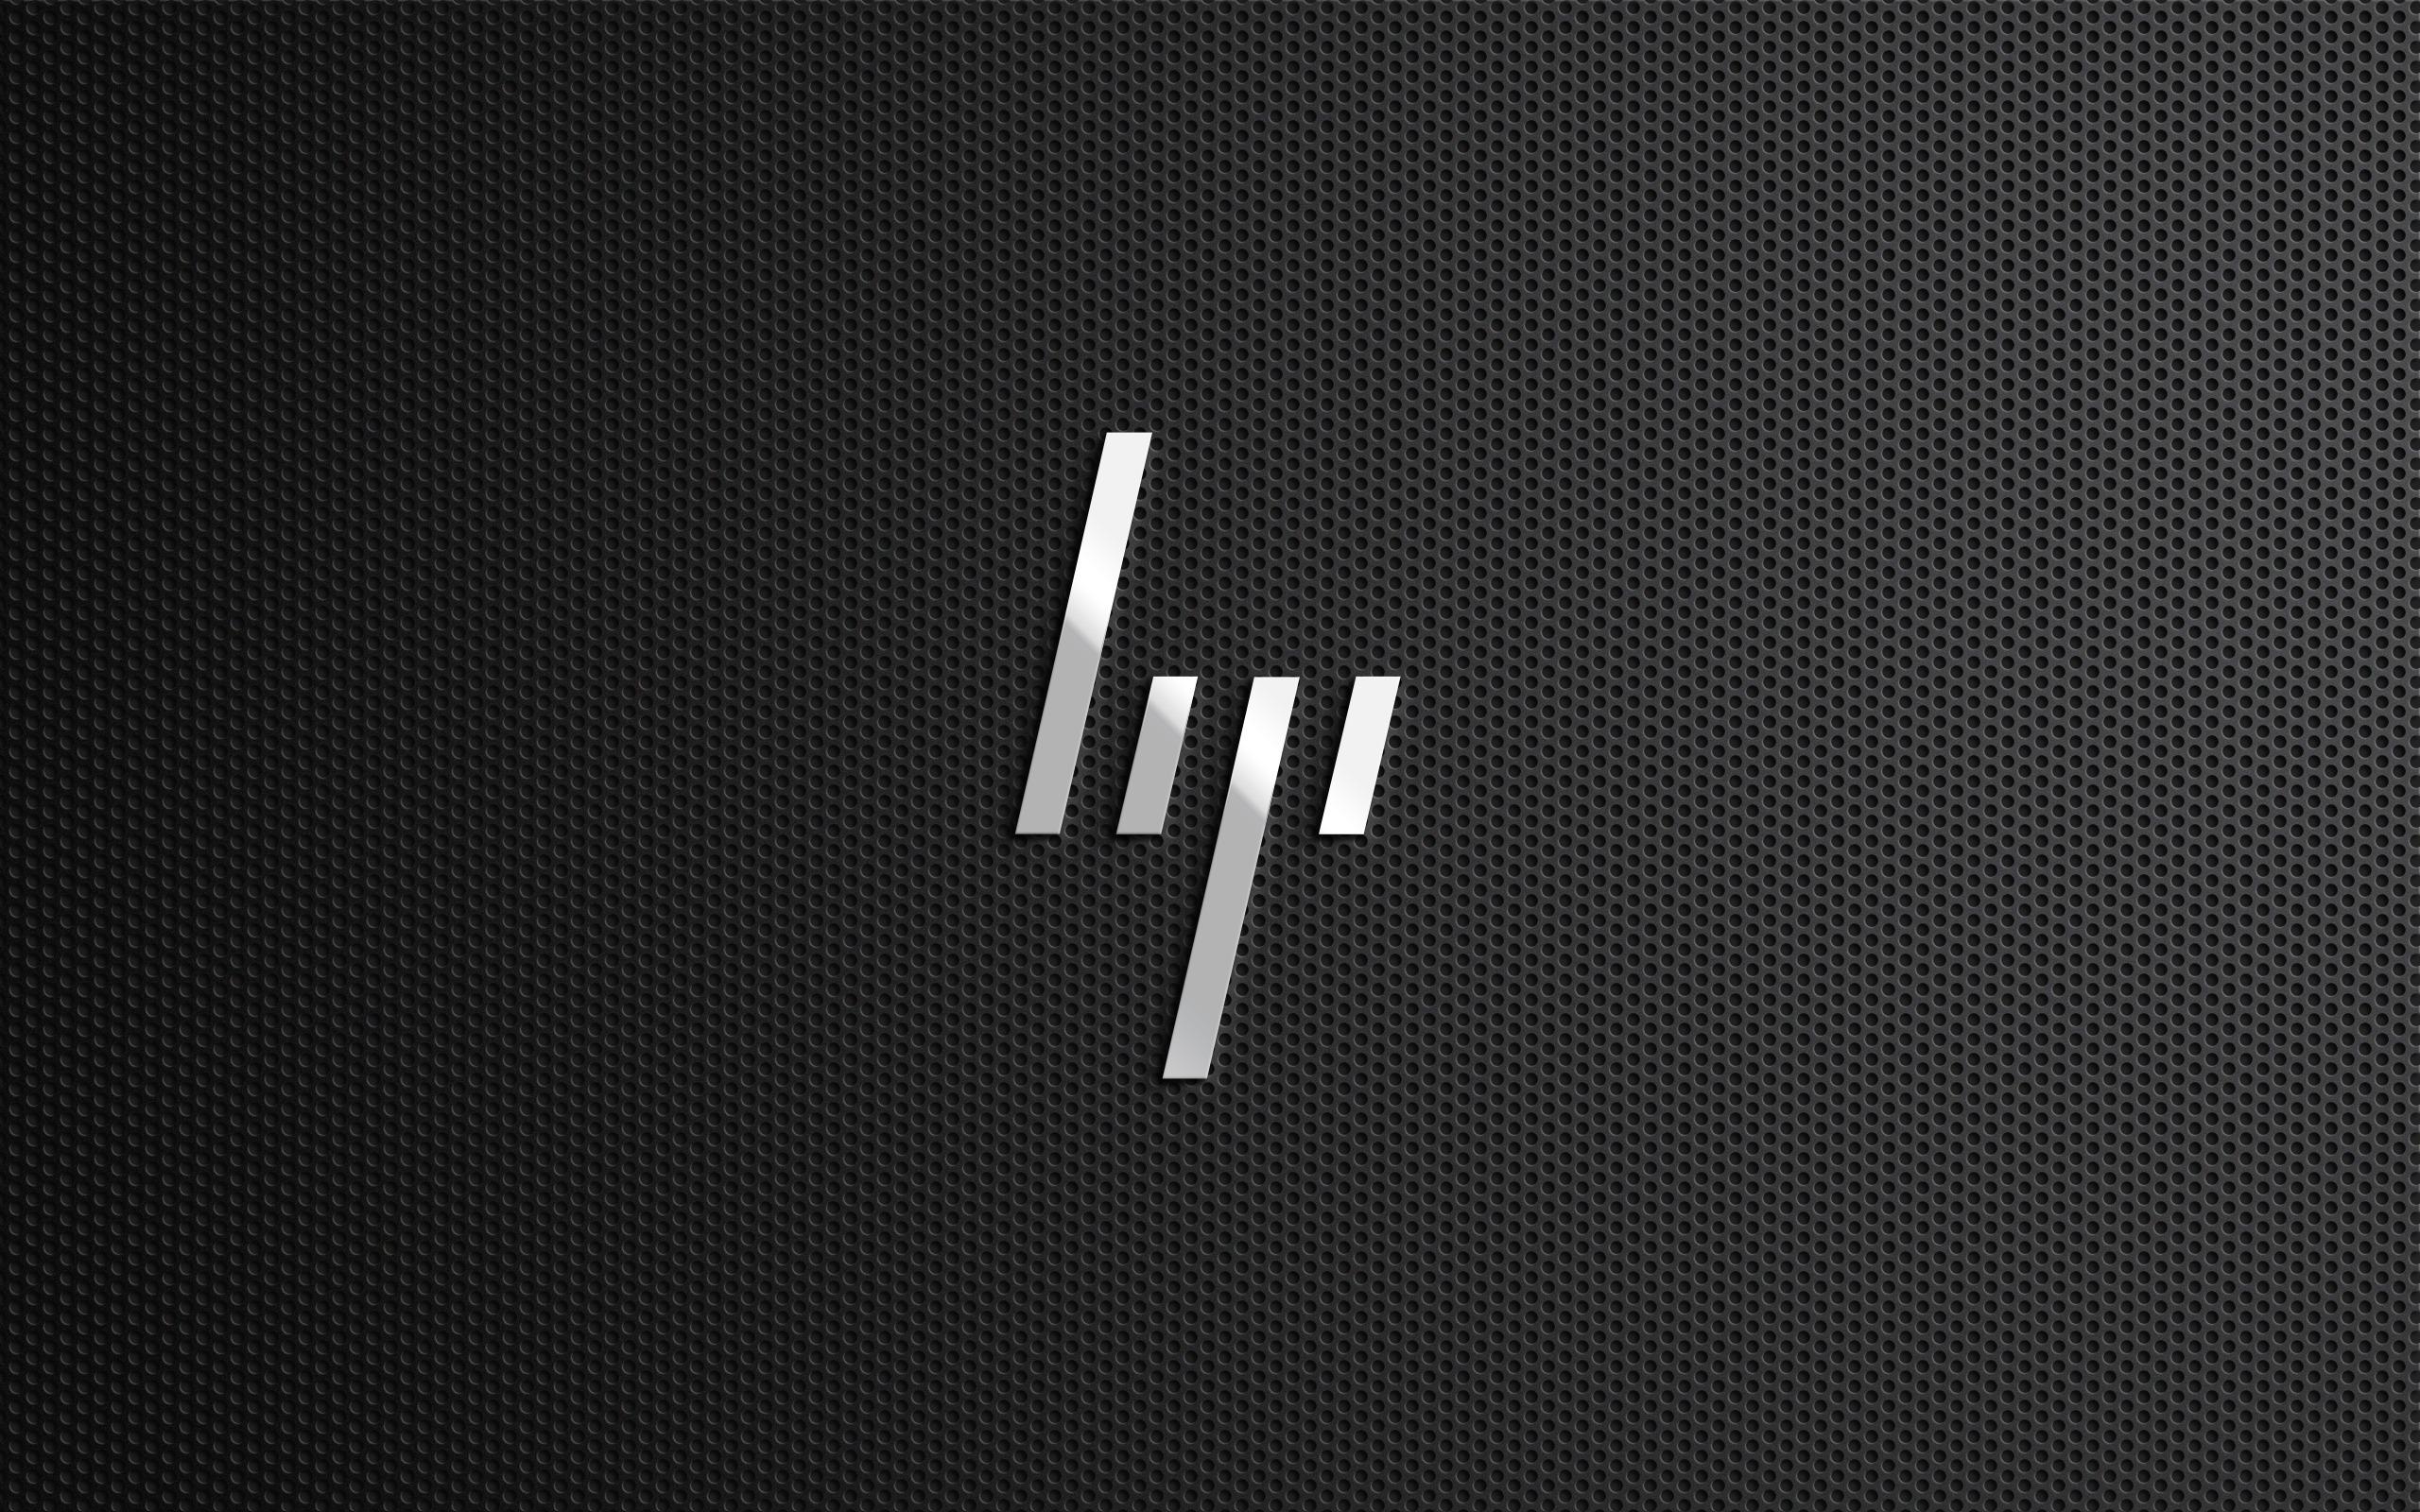 2560x1600 HP Logo desktop PC and Mac wallpaper 2560x1600